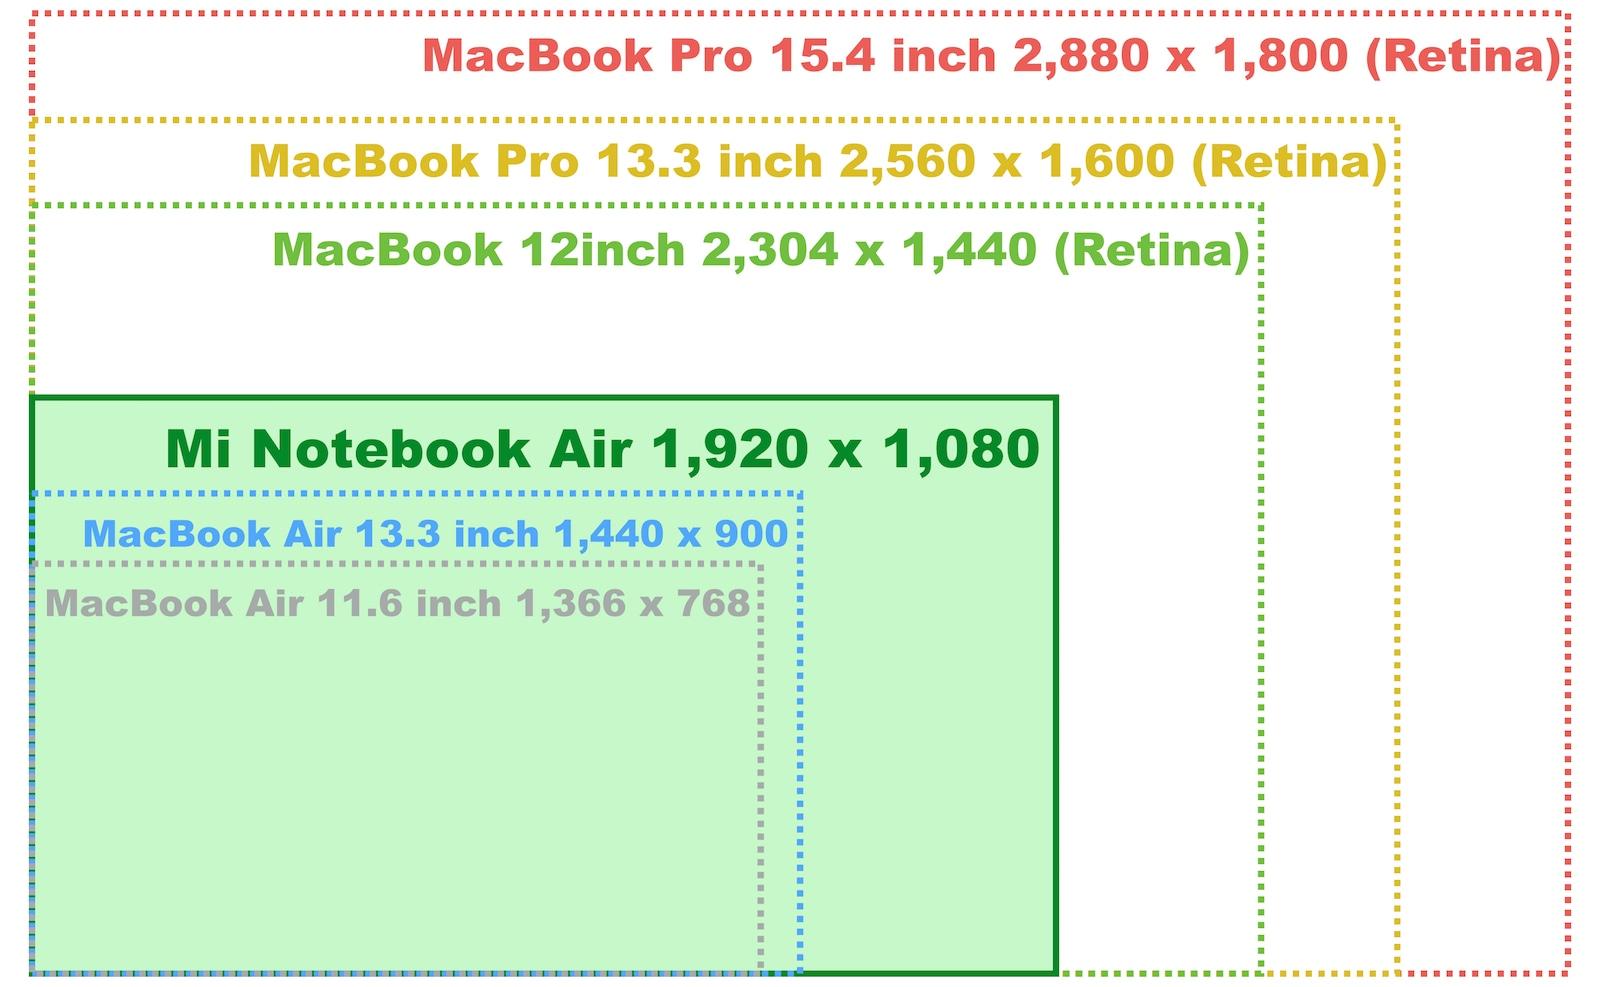 xiaomi-mi-notebook-air-fight-macbook-display